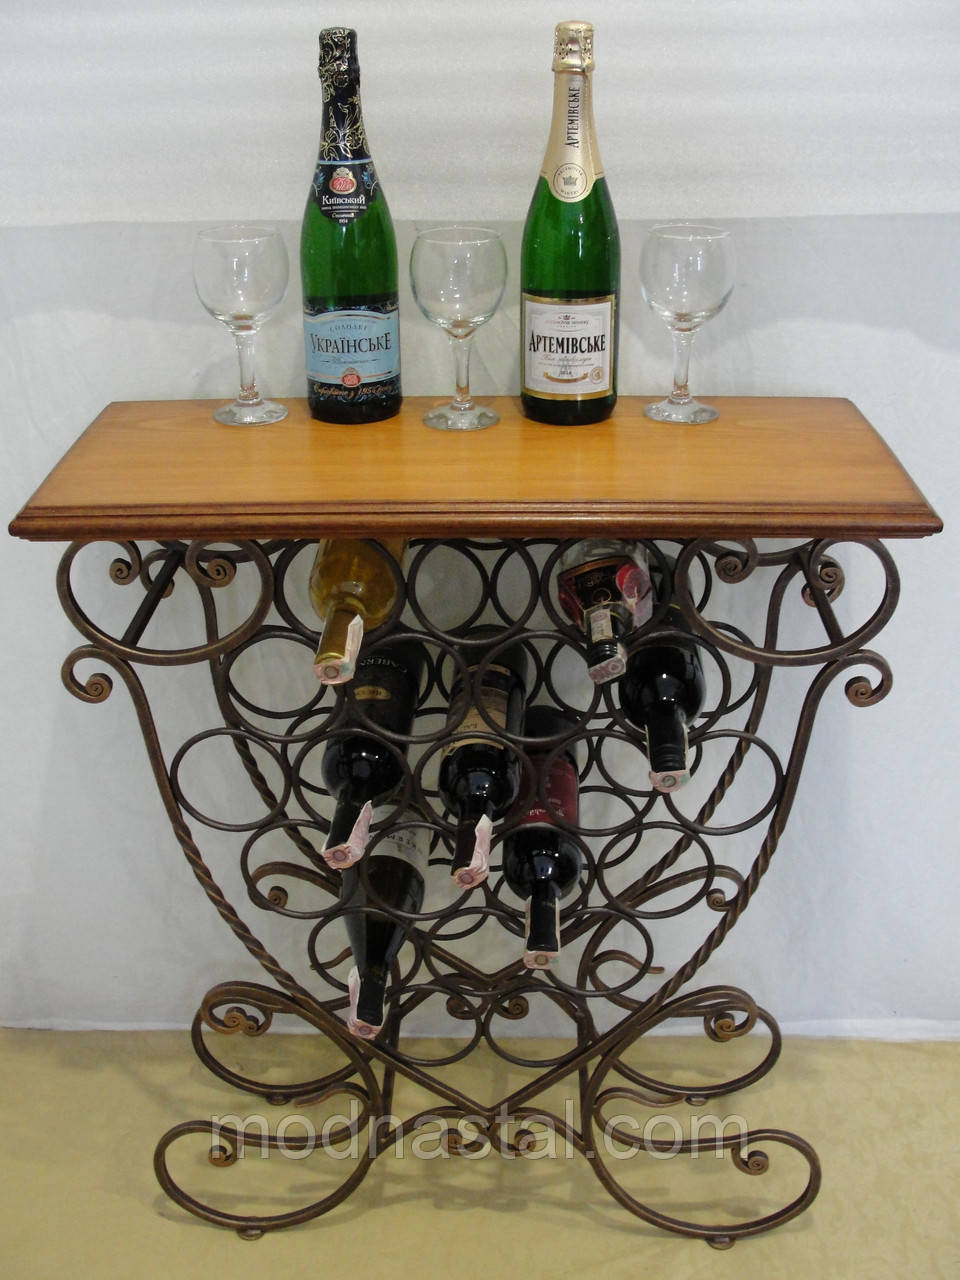 Cтол-стелаж для вина кованый (арт. PVKC-101-21-С)